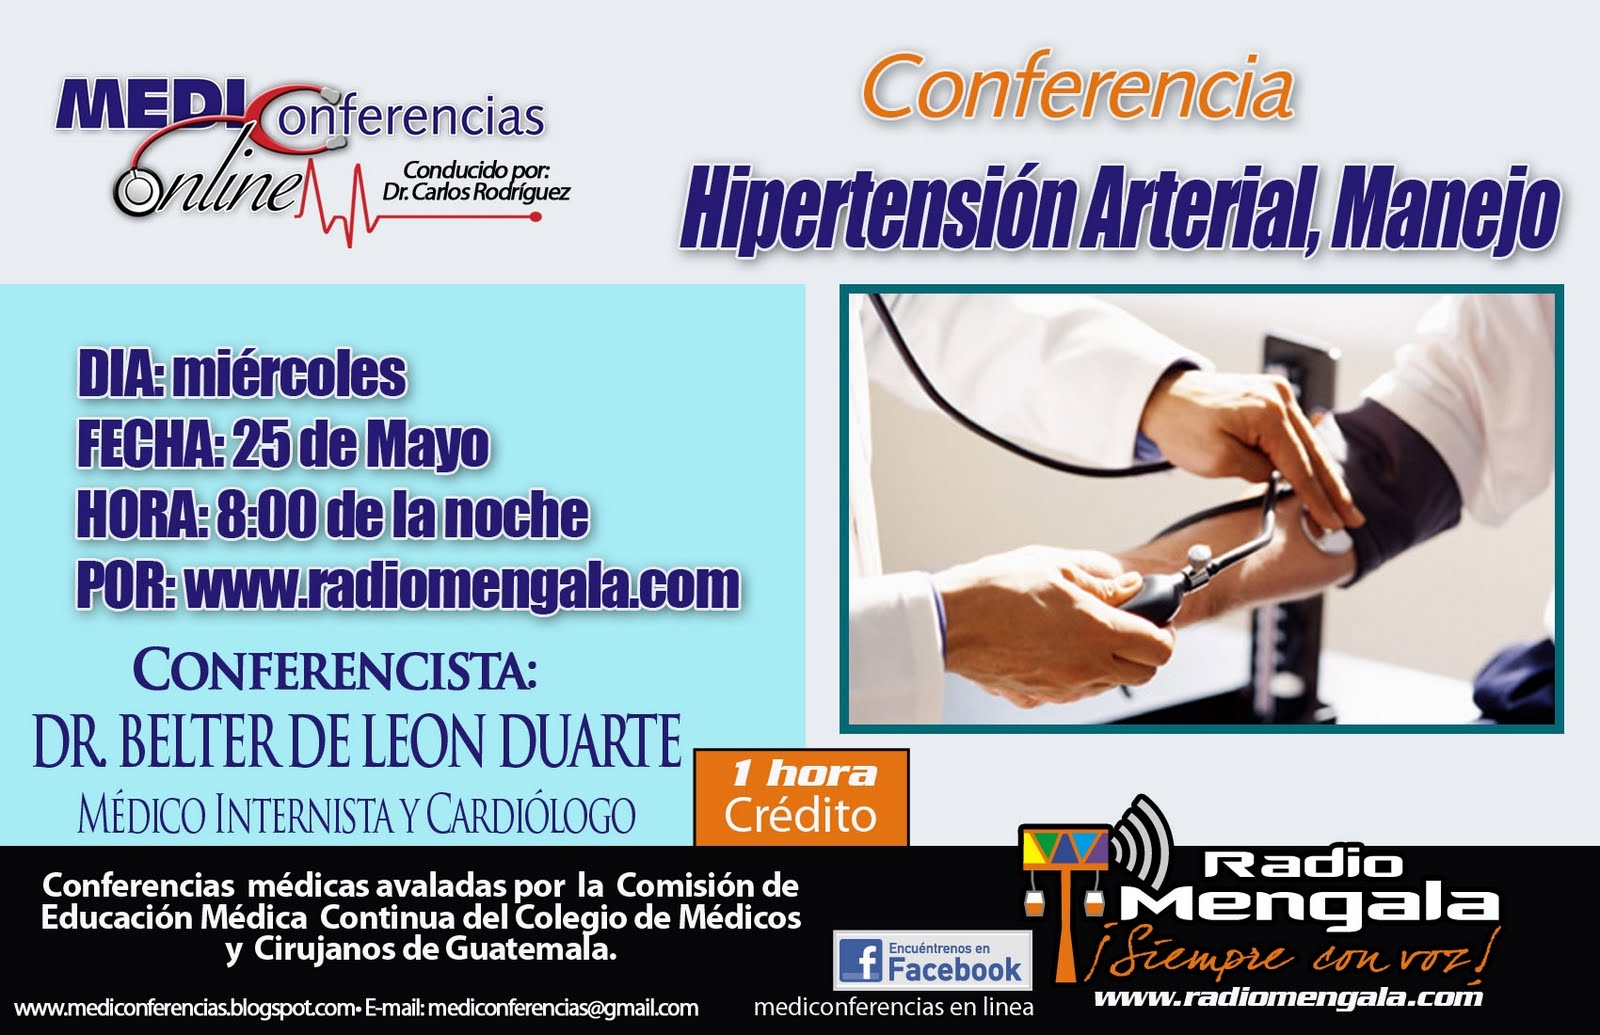 "MEDIconferencias Online: ""HIPERTENSION ARTERIAL, MANEJO.."